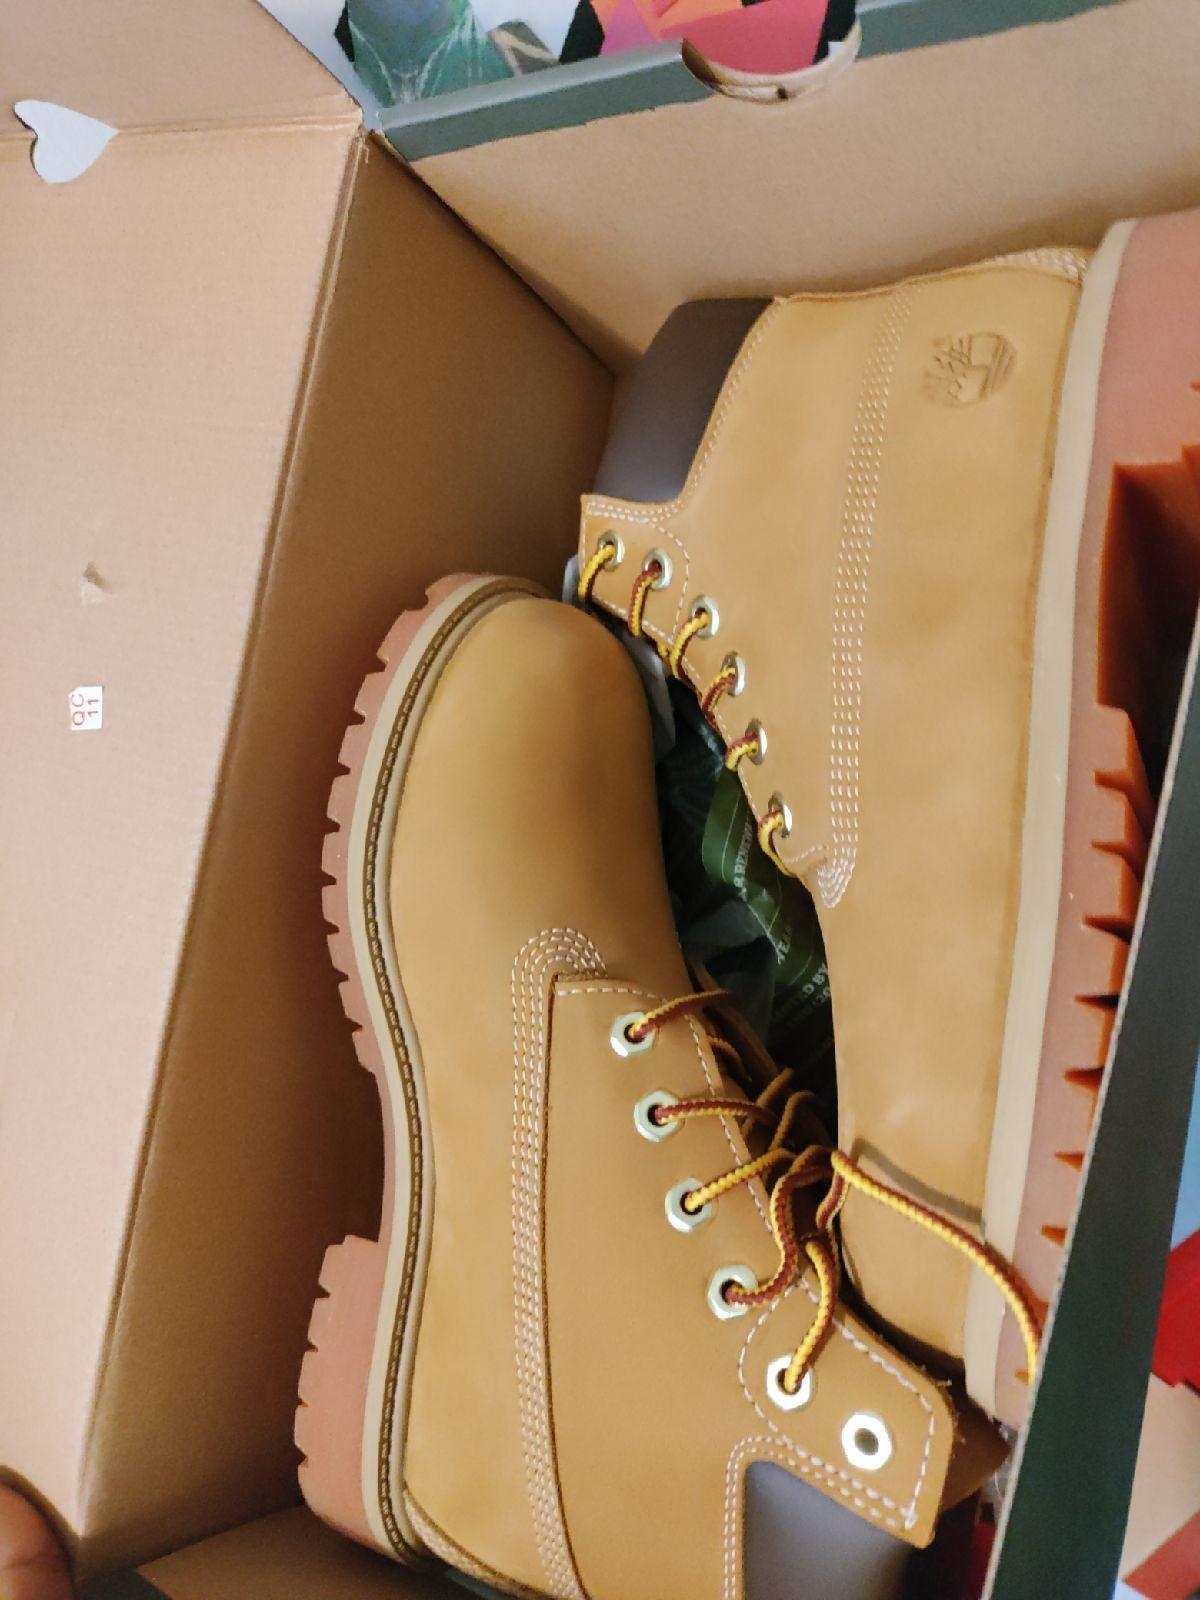 Timberland Boots original box